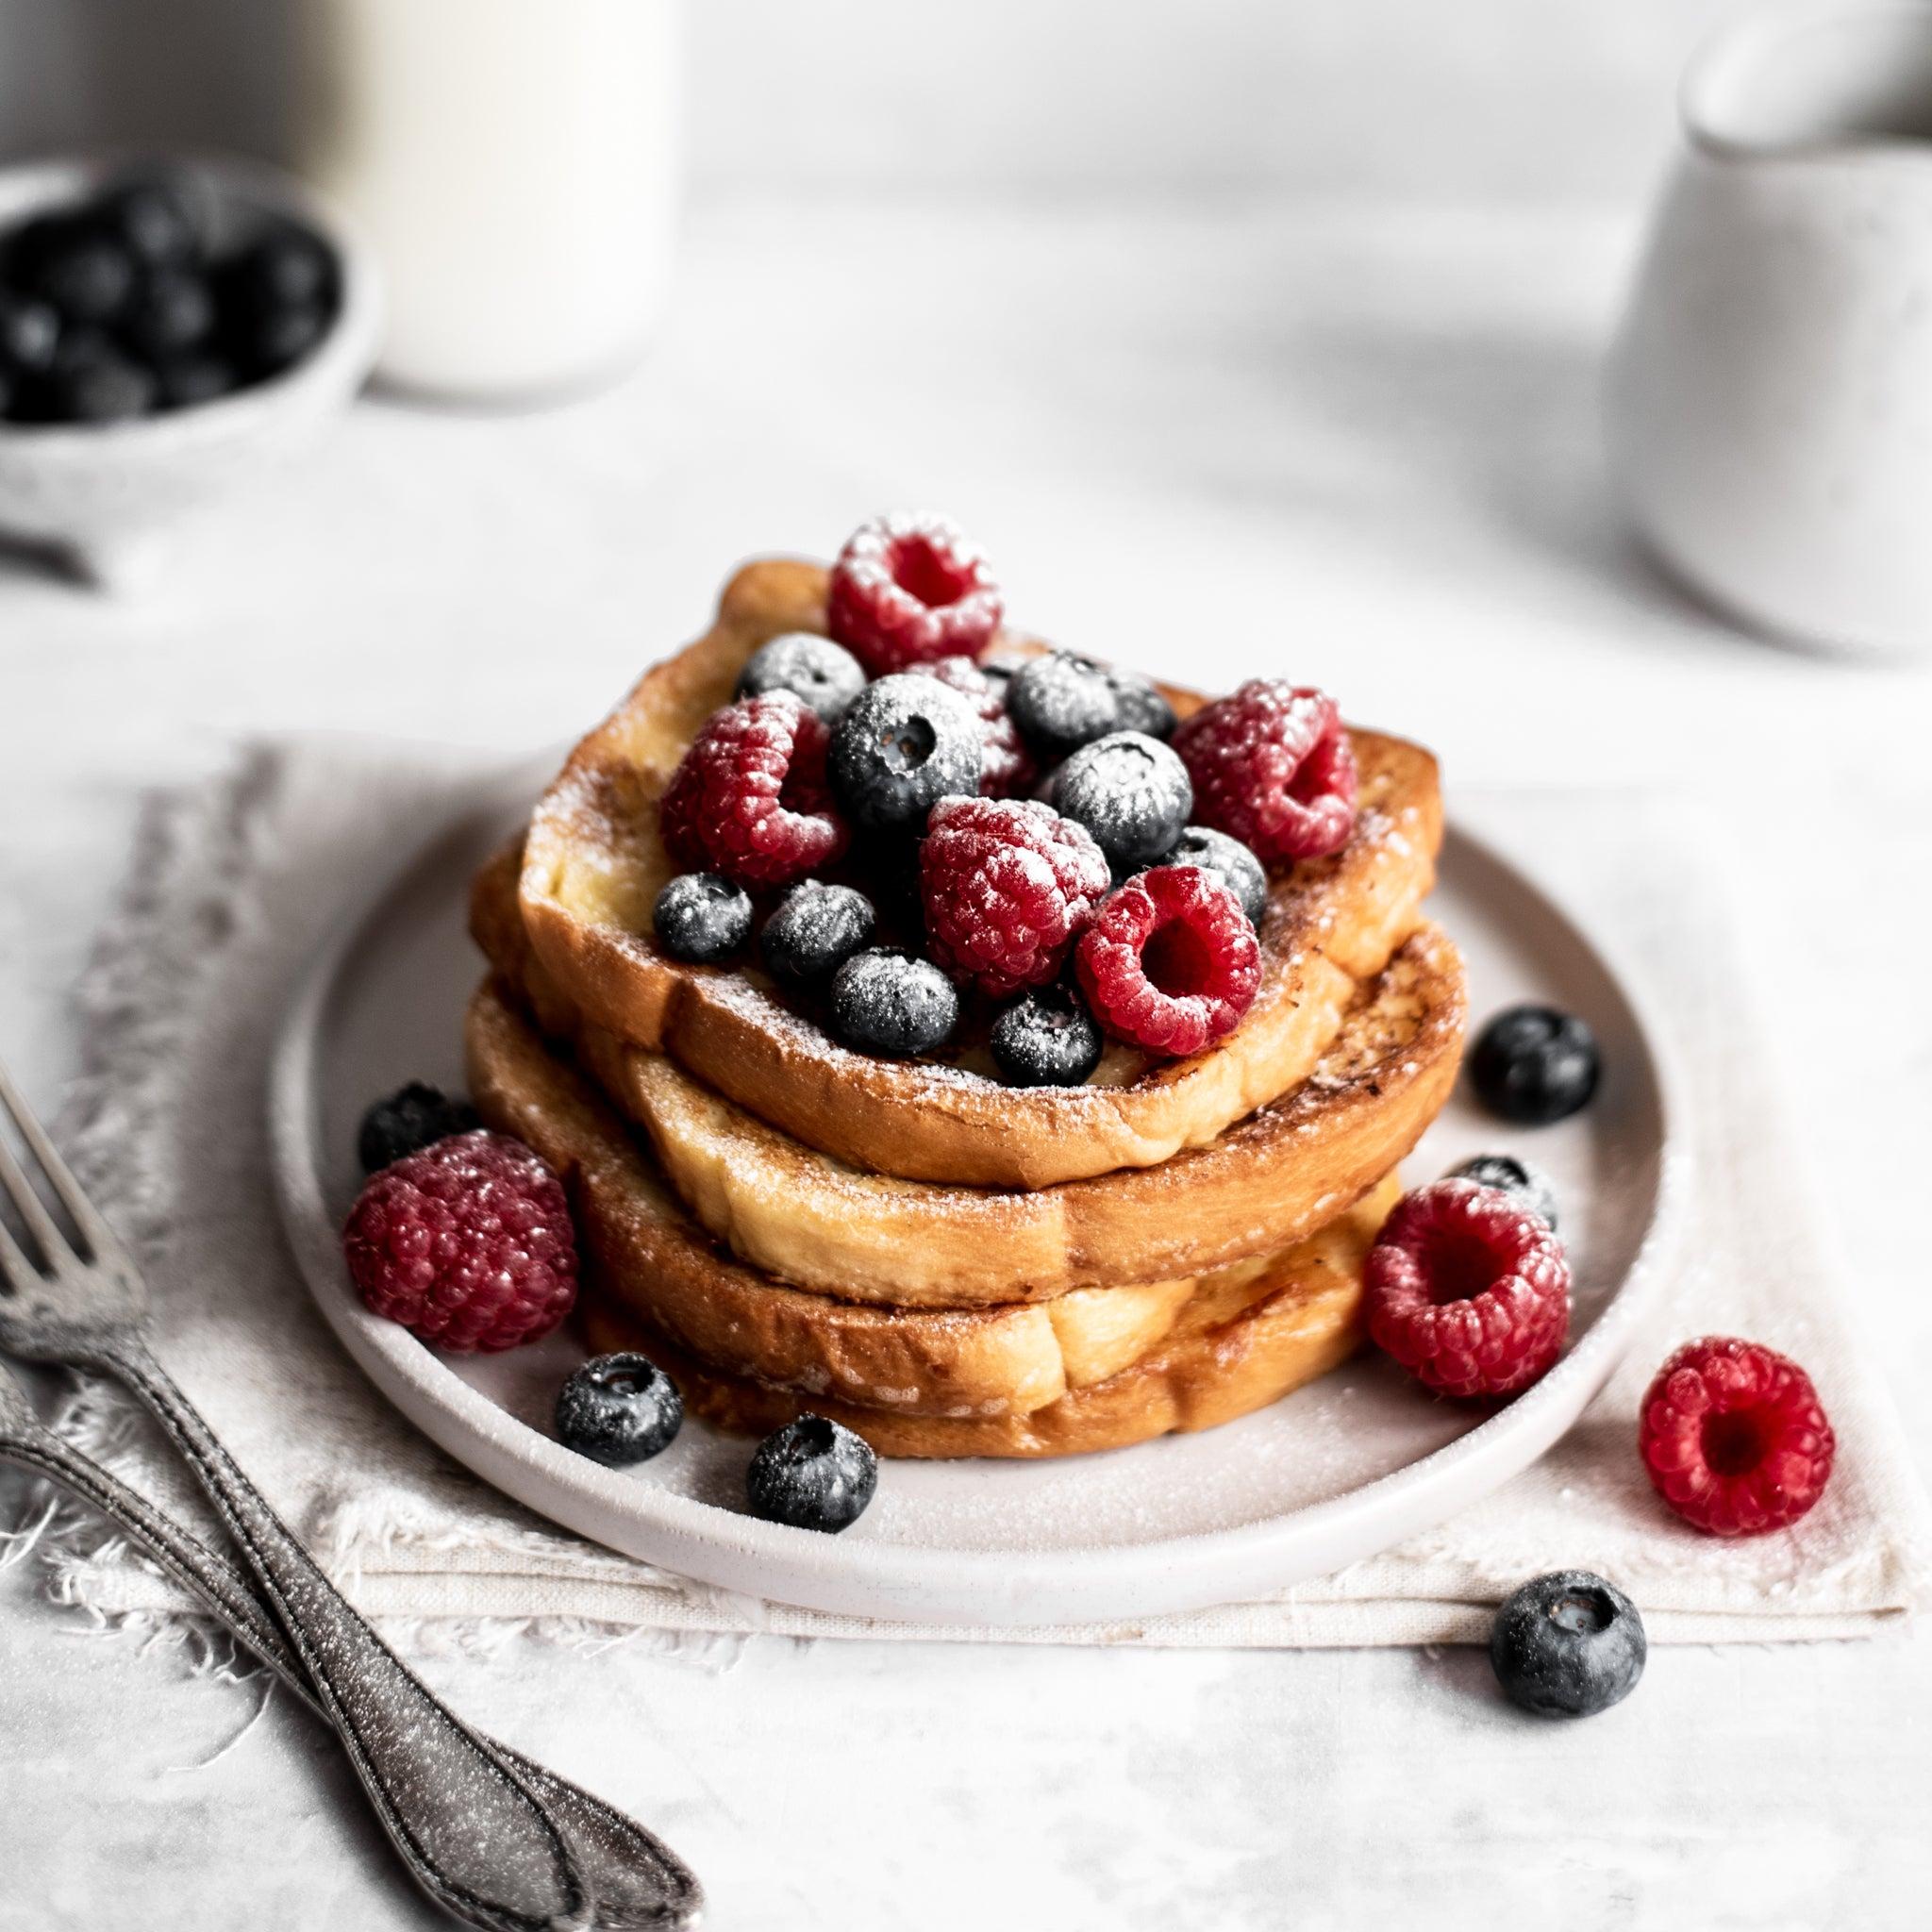 Vanilla-French-Toast-SQUARE-3.jpg